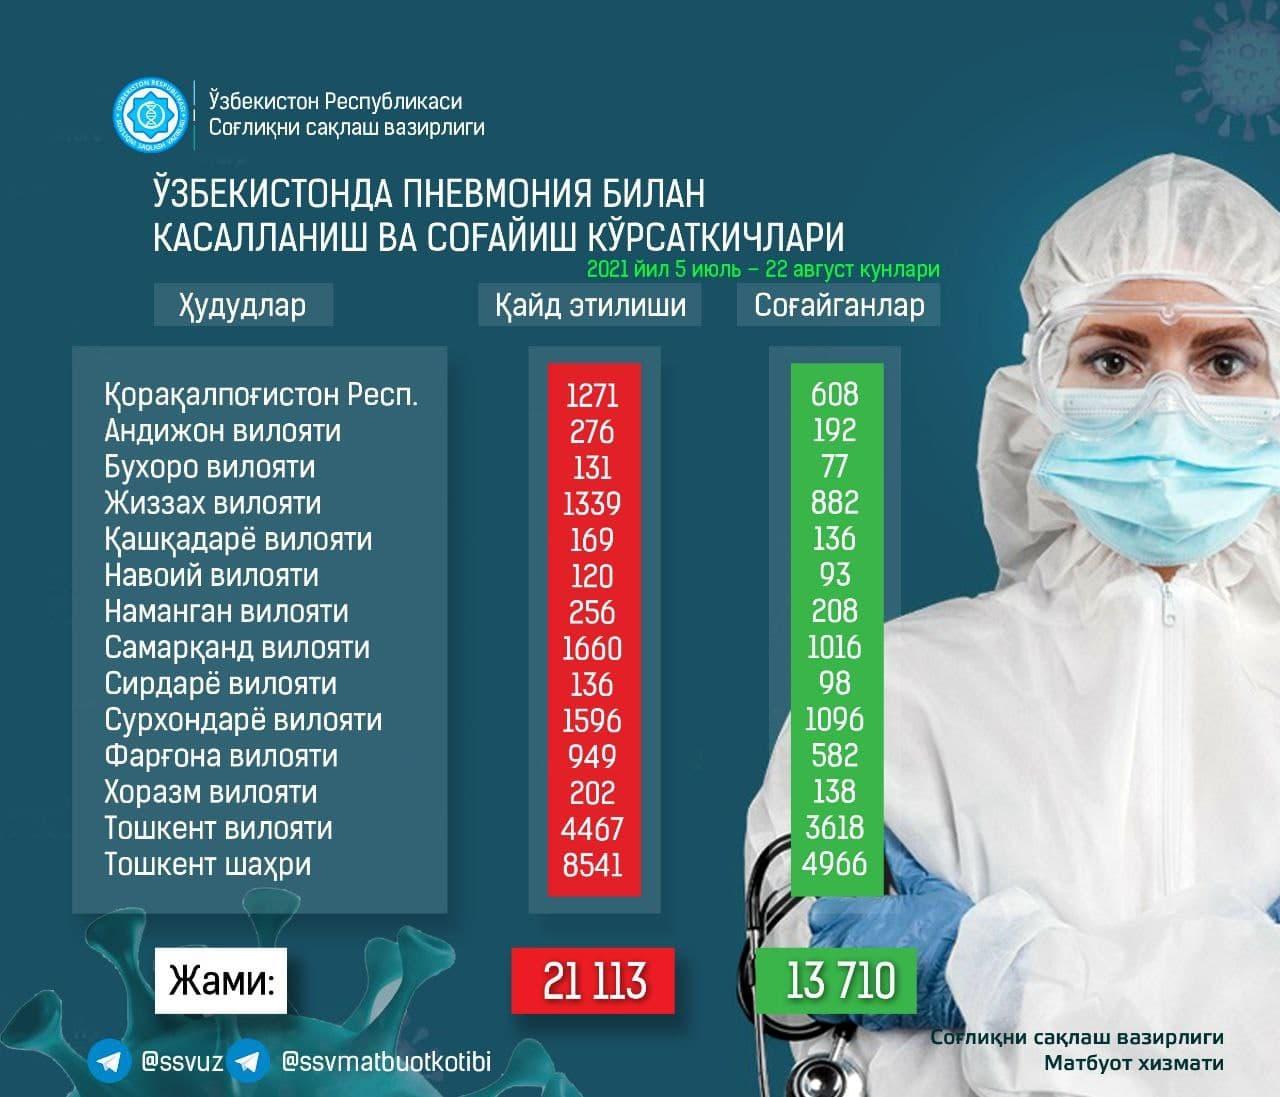 В Узбекистане продолжается спад заболеваемости пневмонией – статистика